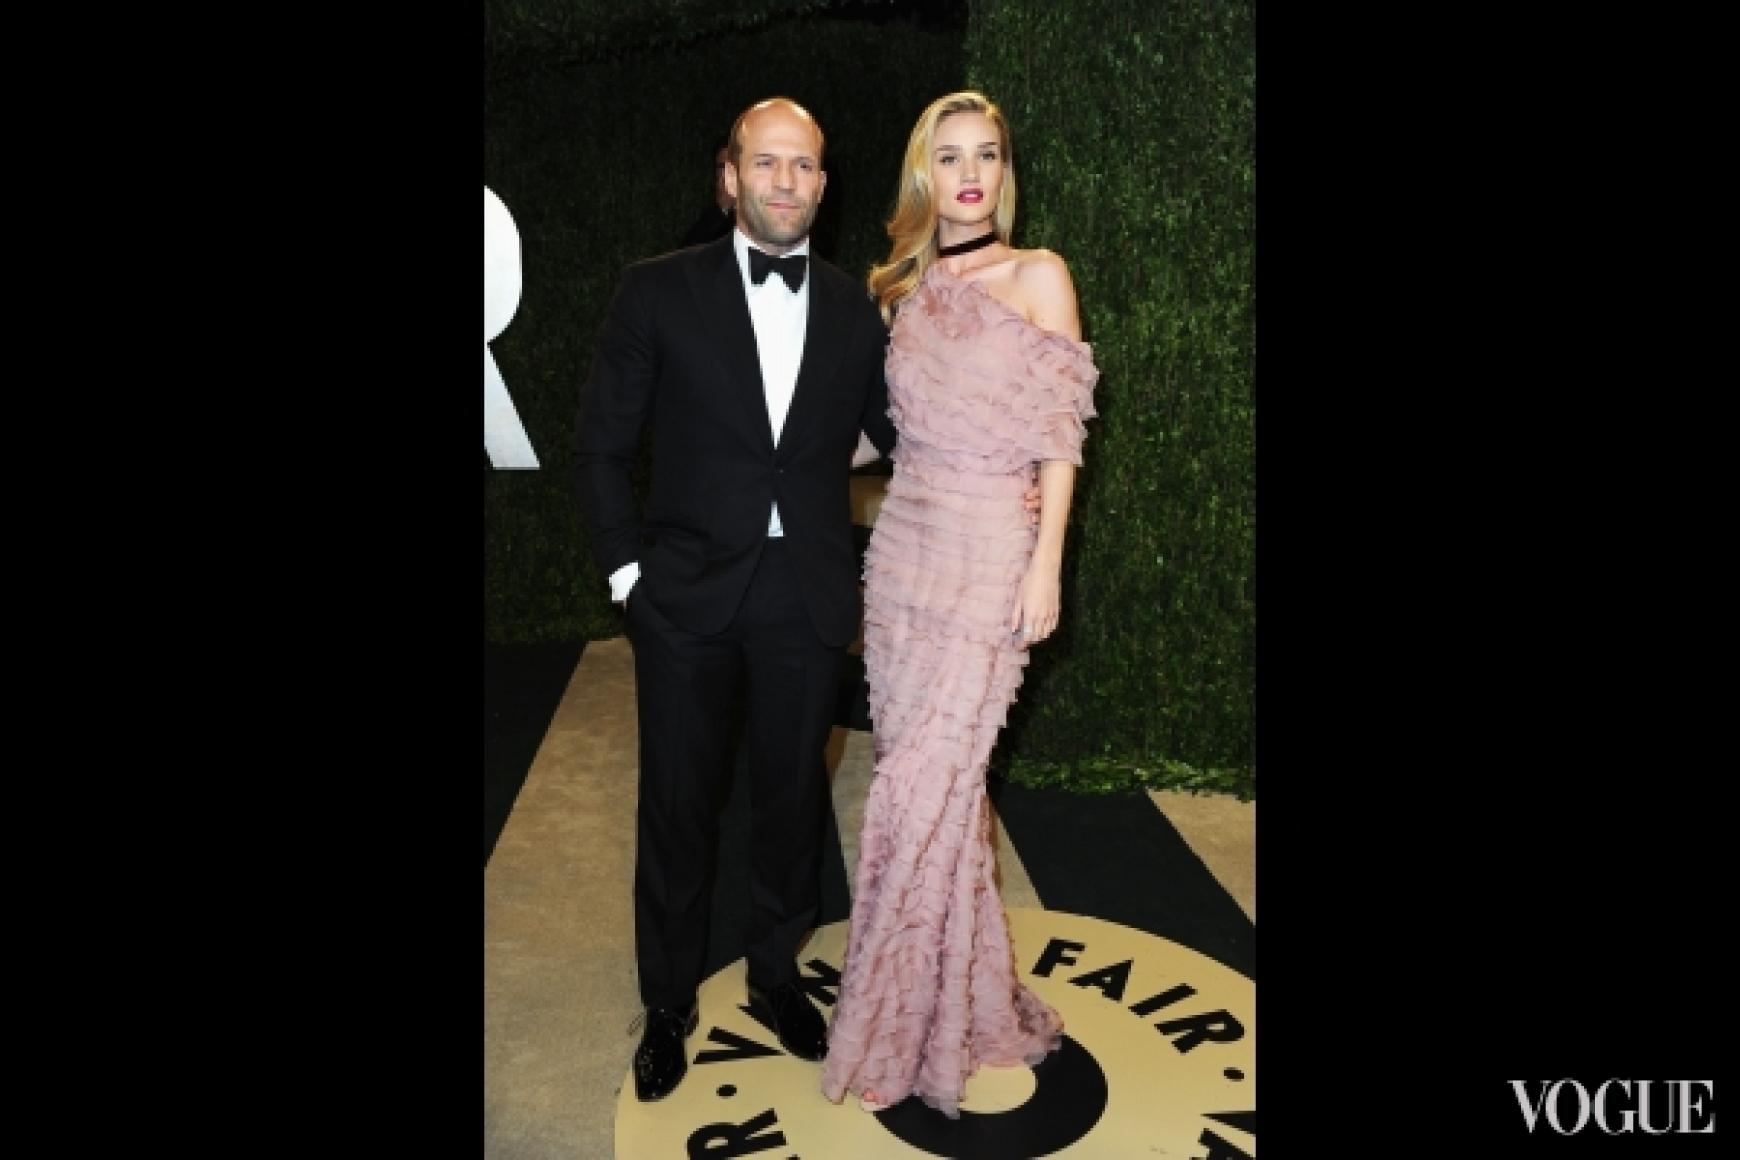 Джейсон Стэтхэм и Рози Хантингтон-Уайтли в платье Valentino Fall 2012 Couture